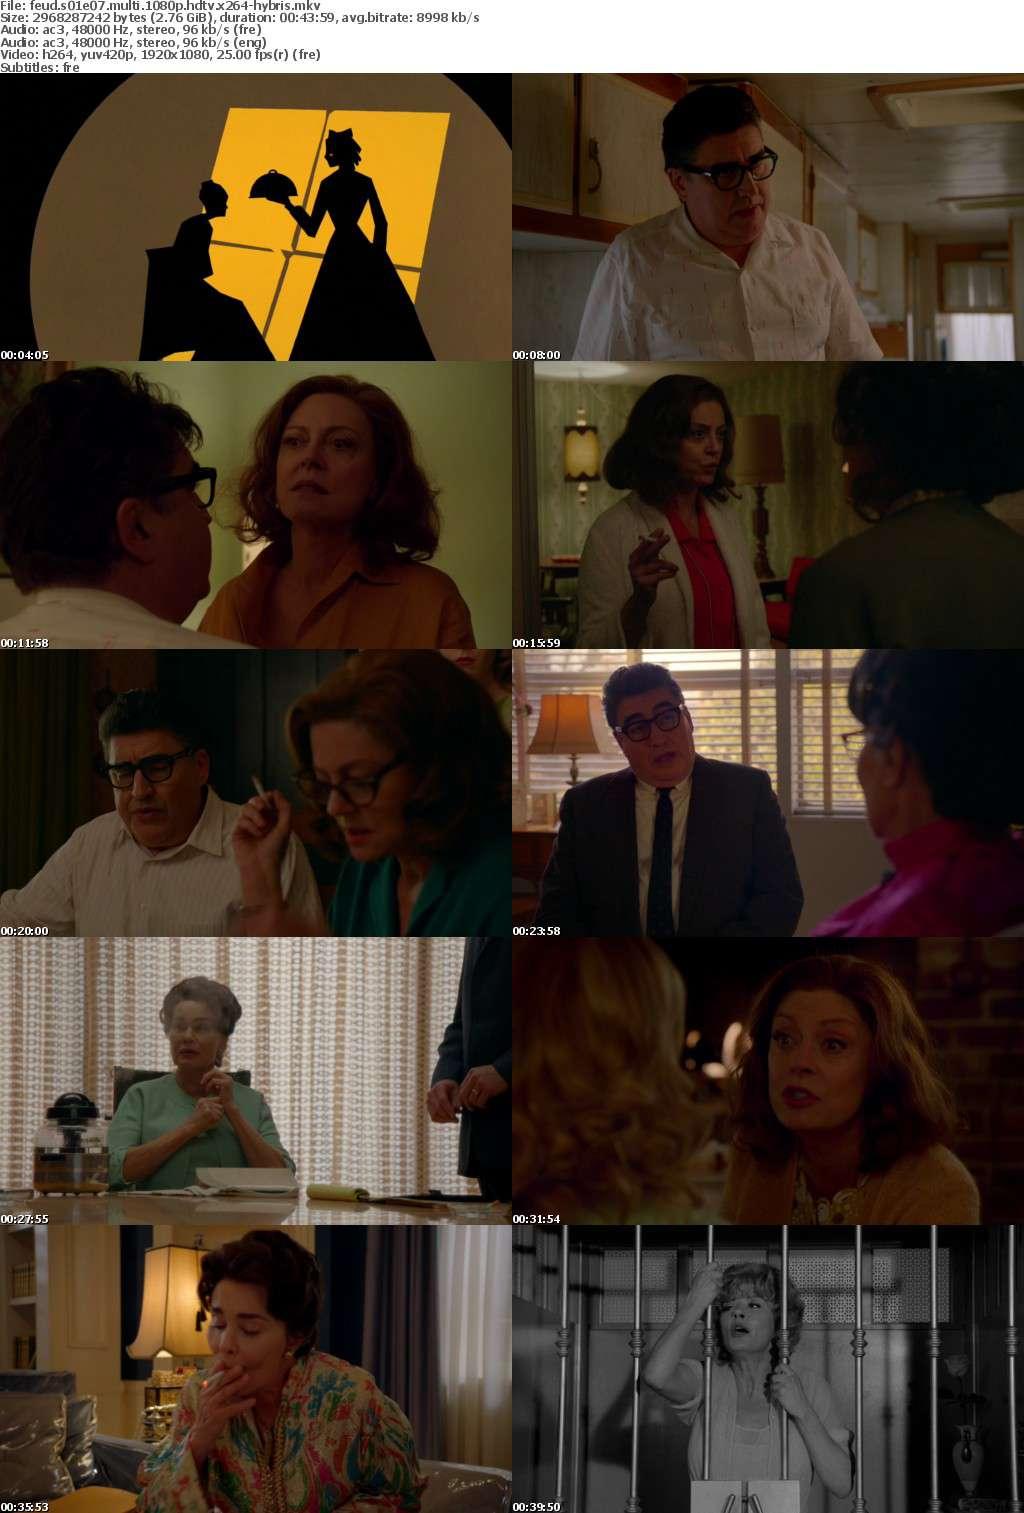 Feud S01E07 MULTi 1080p HDTV x264-HYBRiS